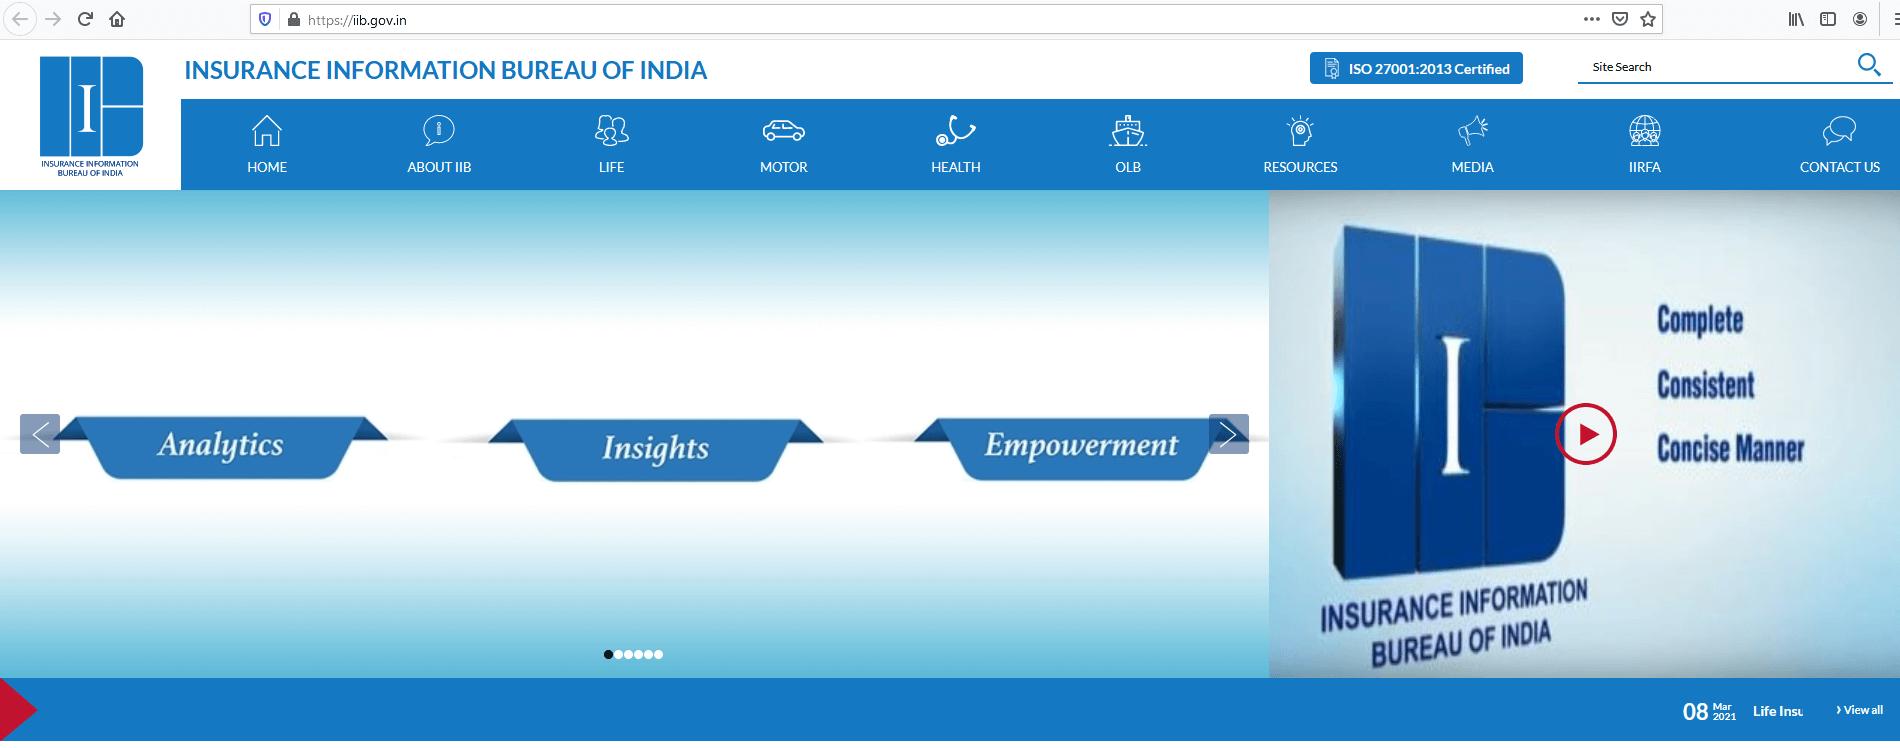 Insurance Information Bureau of India Homepage